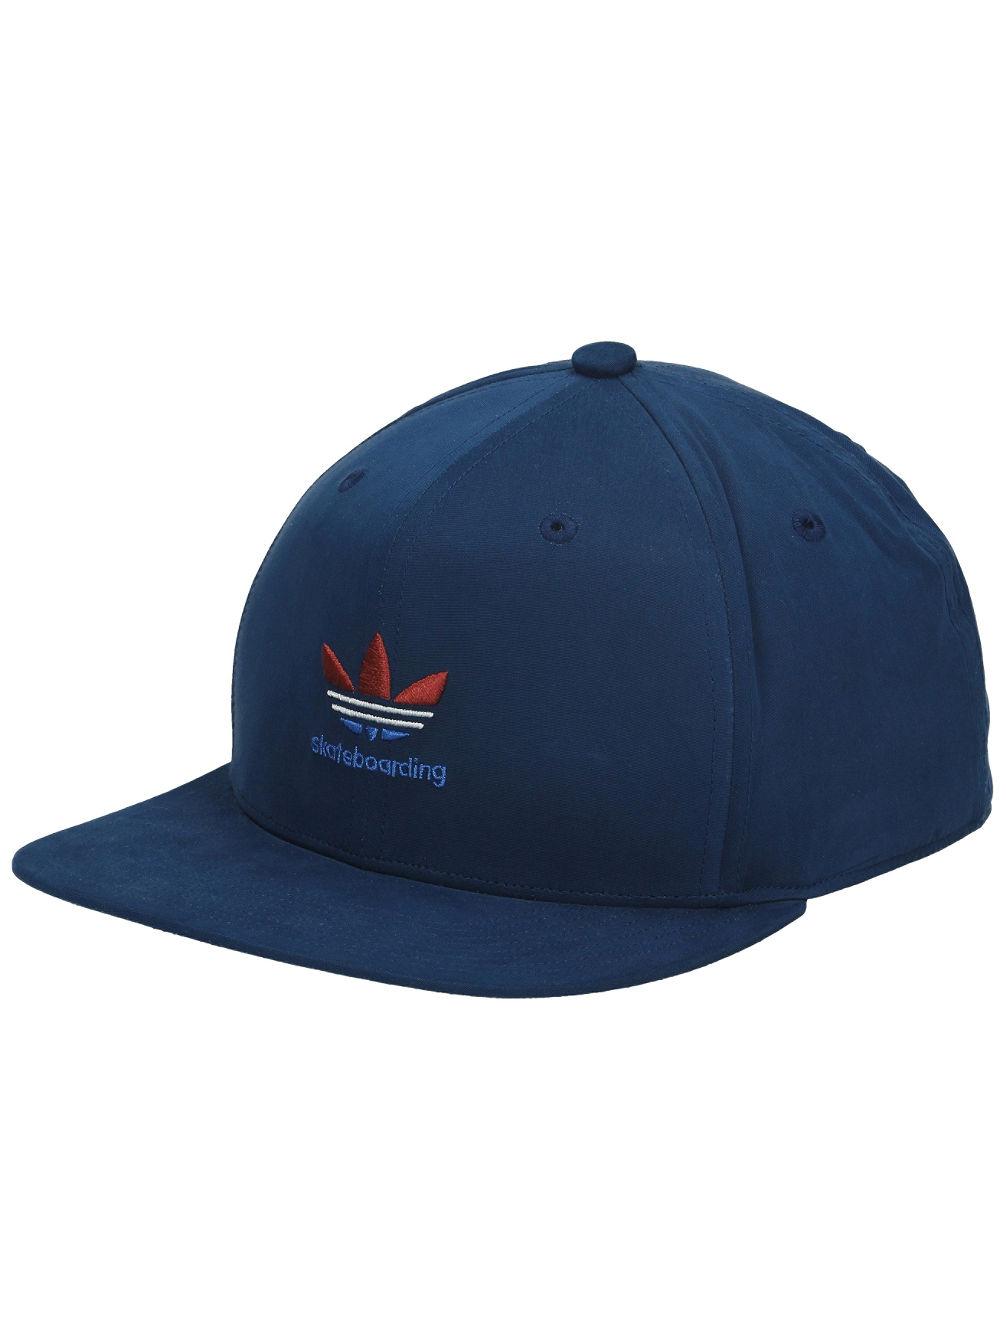 adidas-skateboarding-nautical-trefoil-snapback-cap